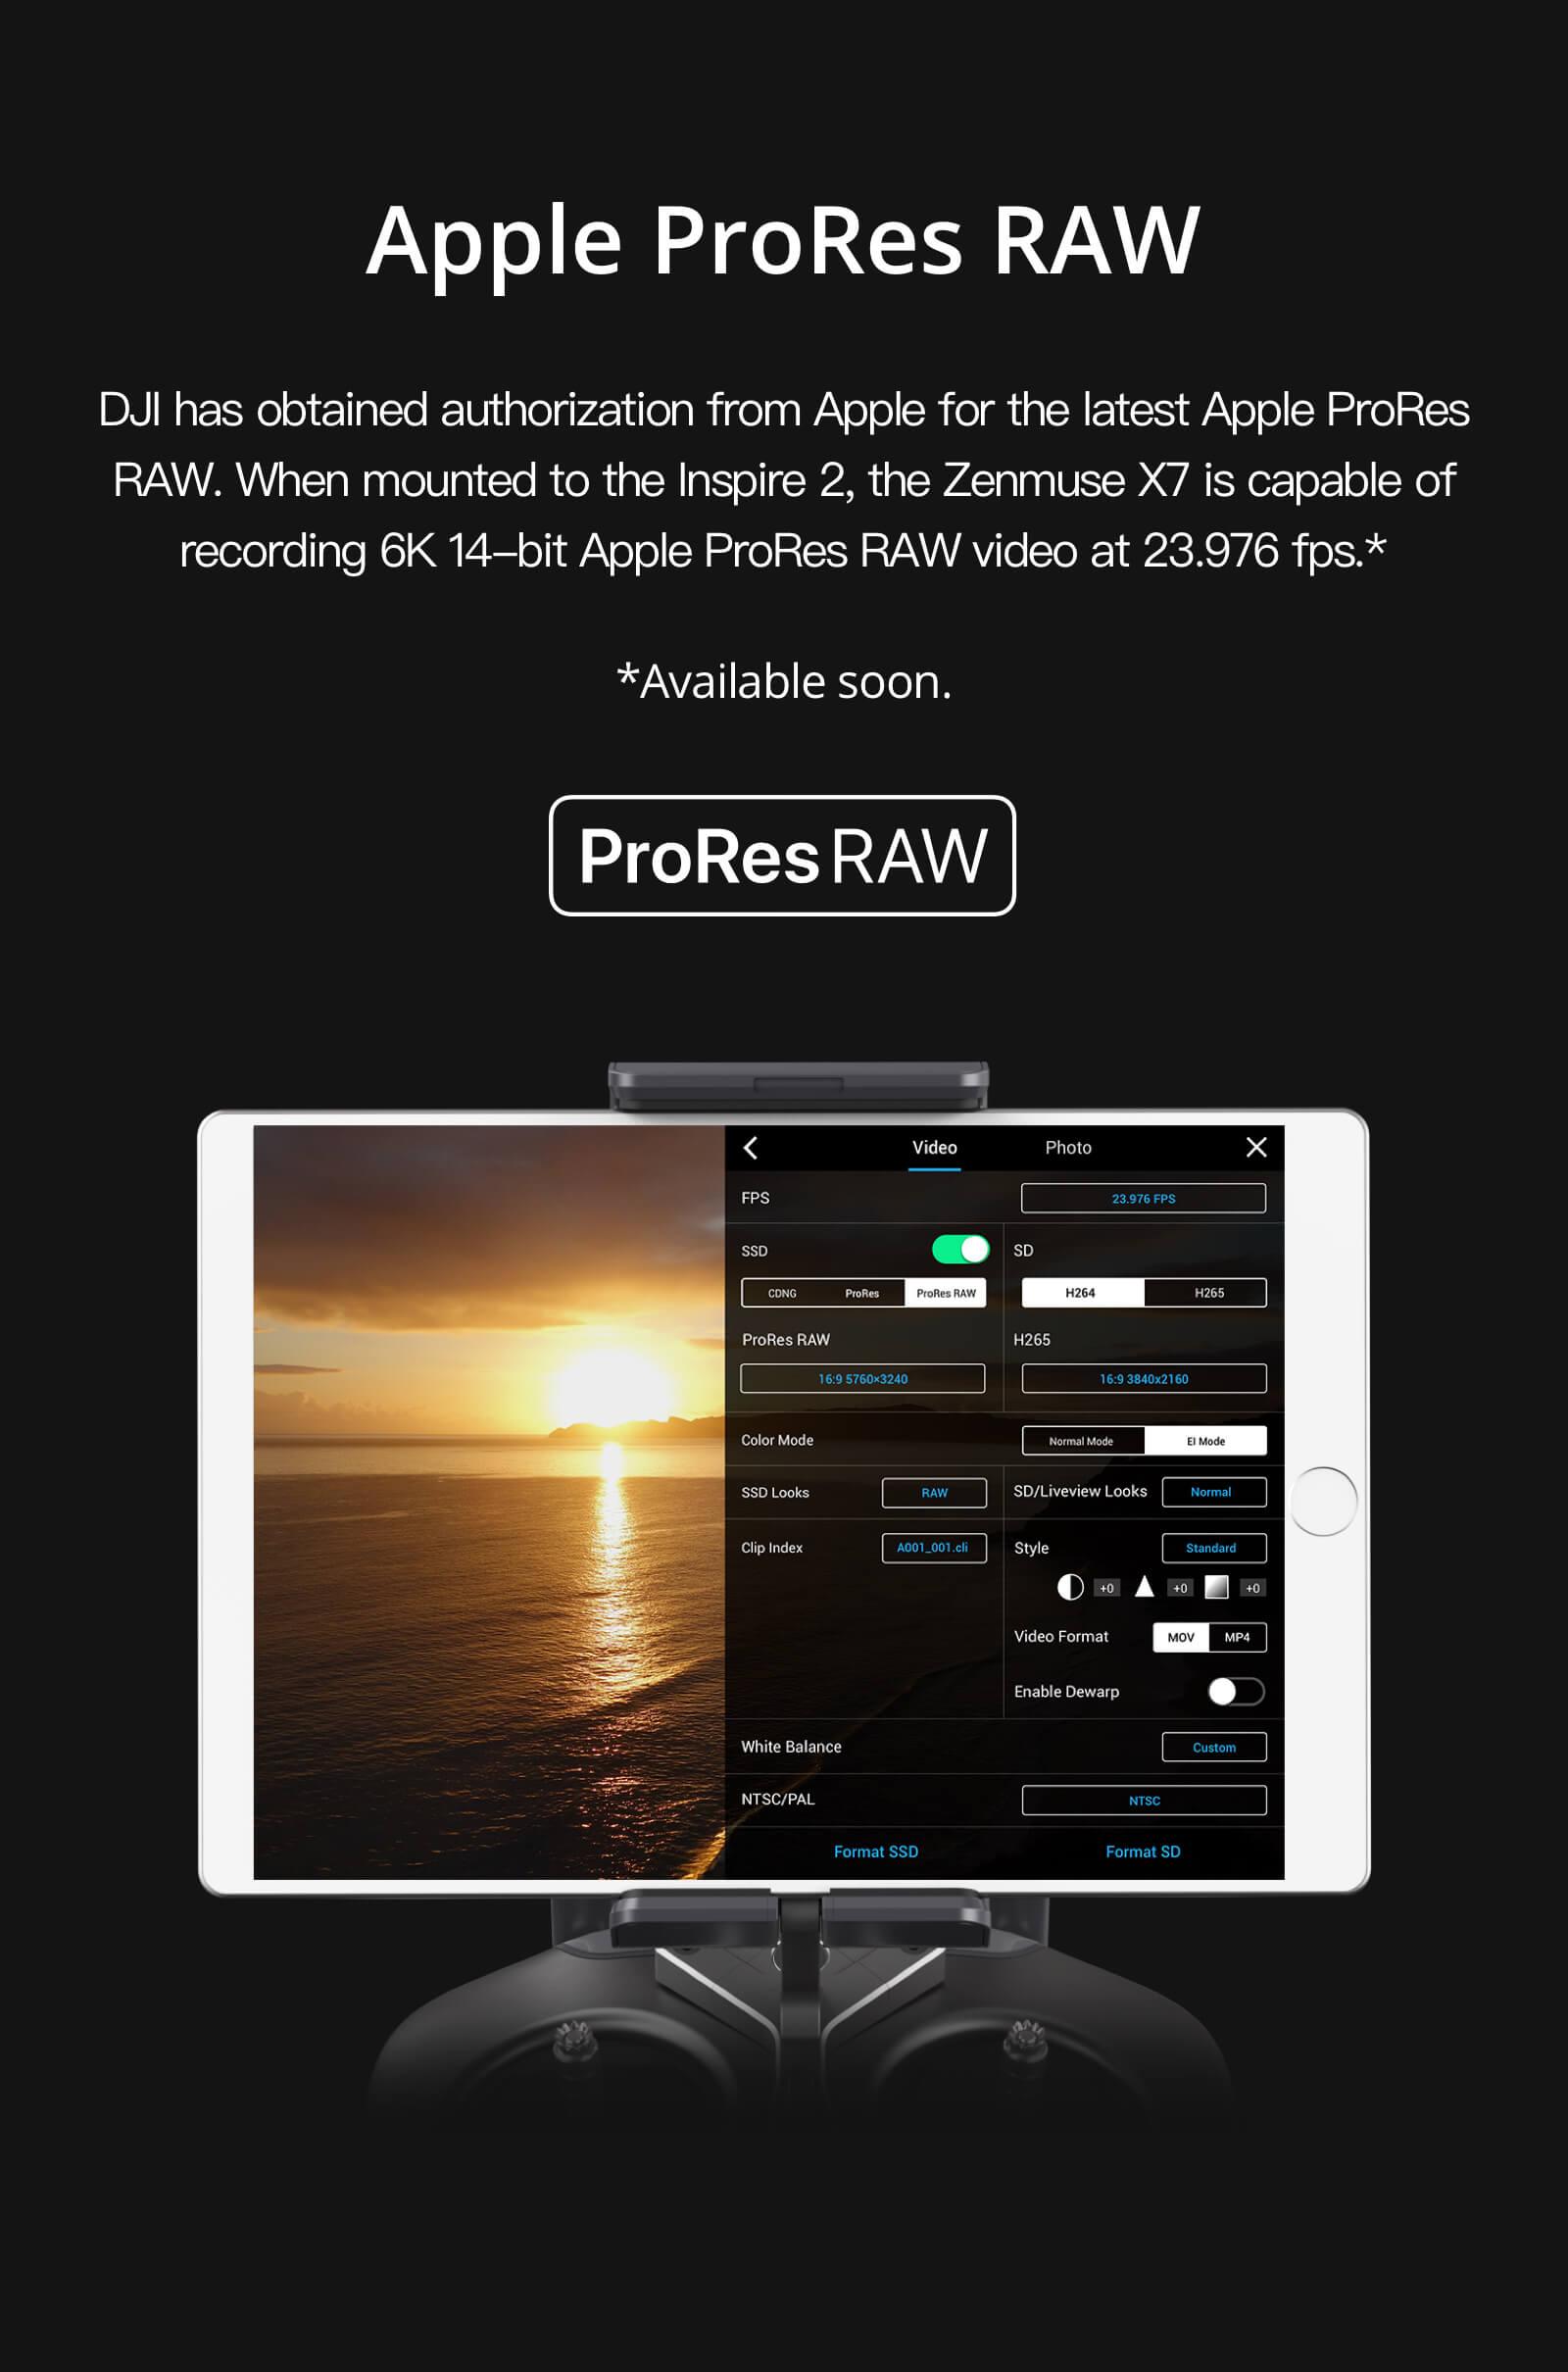 DJI Zenmuse X7 Apple ProRes RAW